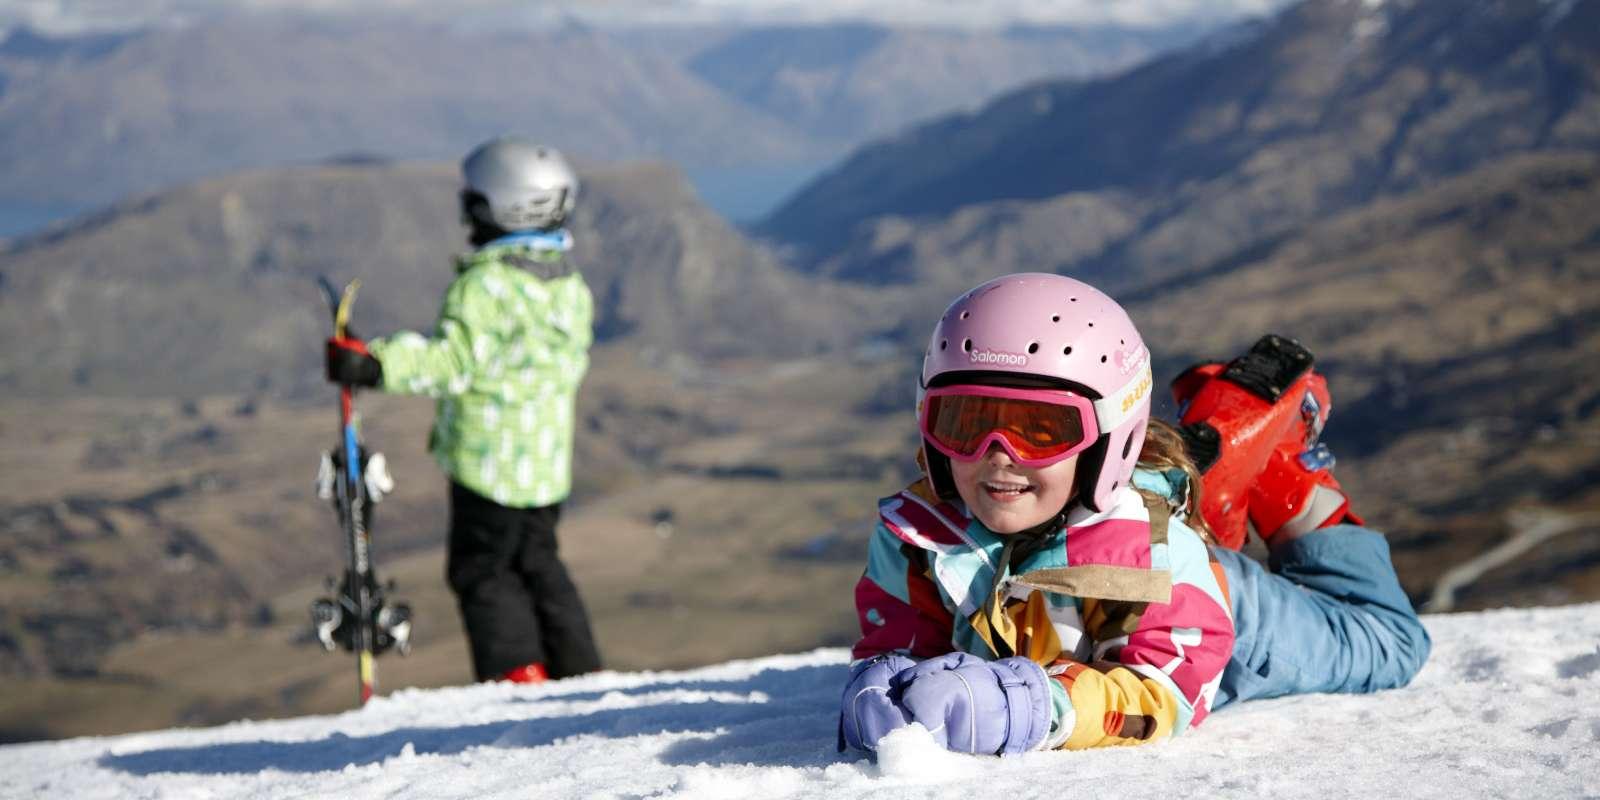 Family ski day at Coronet Peak